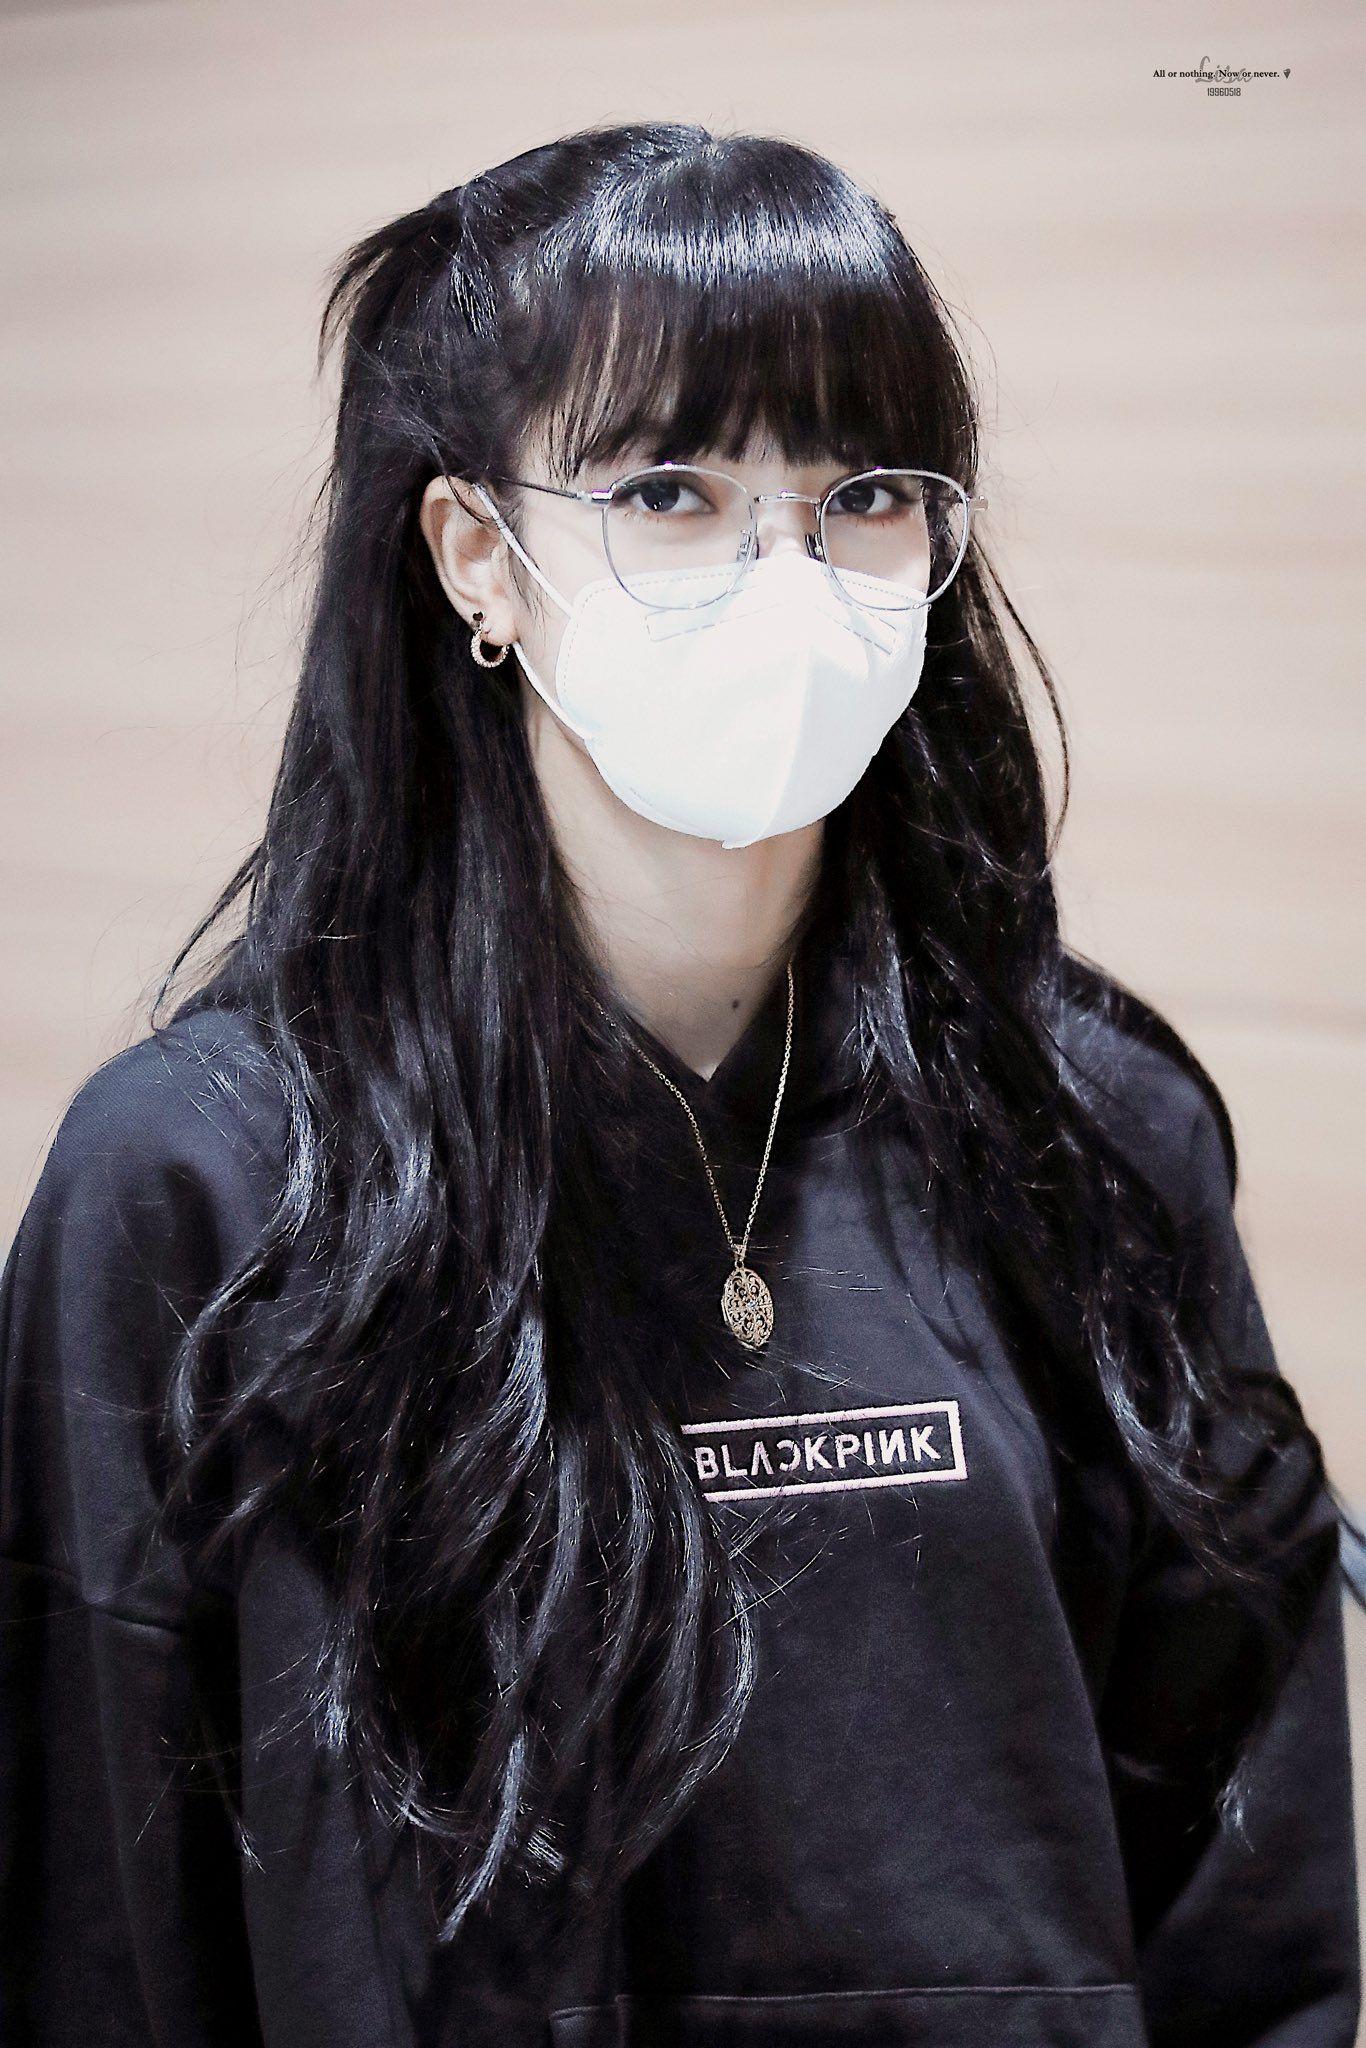 Pin By R O S E 장미 On K Pop Style Blackpink Lisa Blackpink Wallpaper Blackpink Lisa